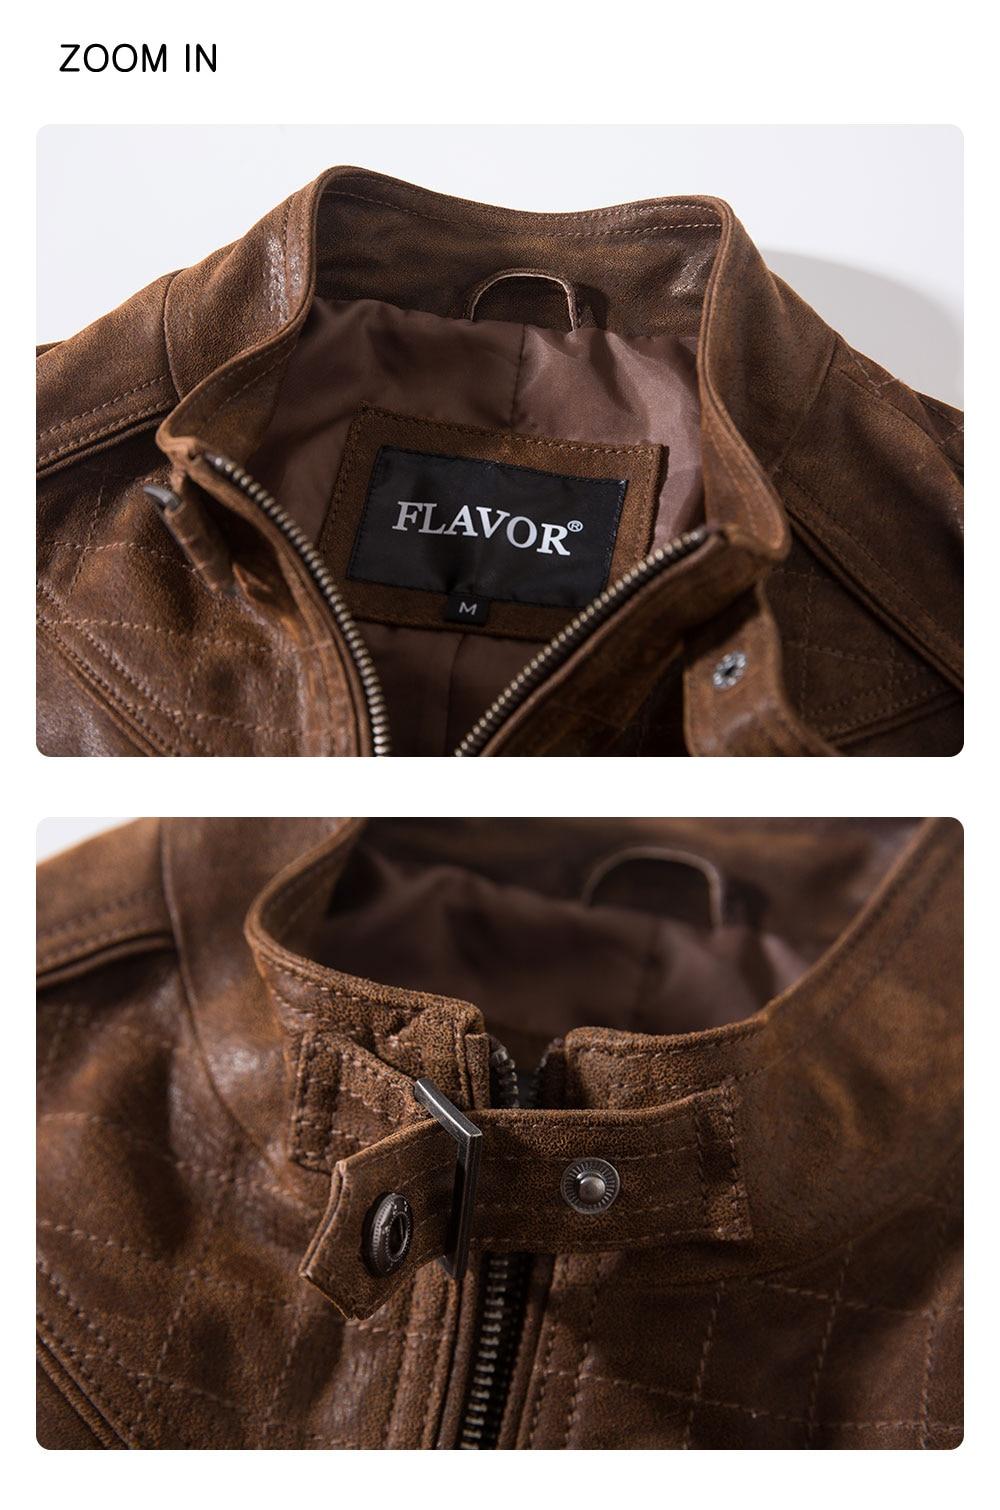 Hd0bfbc102cfc4821a2de4937911607bcB Men's Pigskin Real Leather Jacket Genuine Leather Jackets Motorcycle Jacket Coat Men